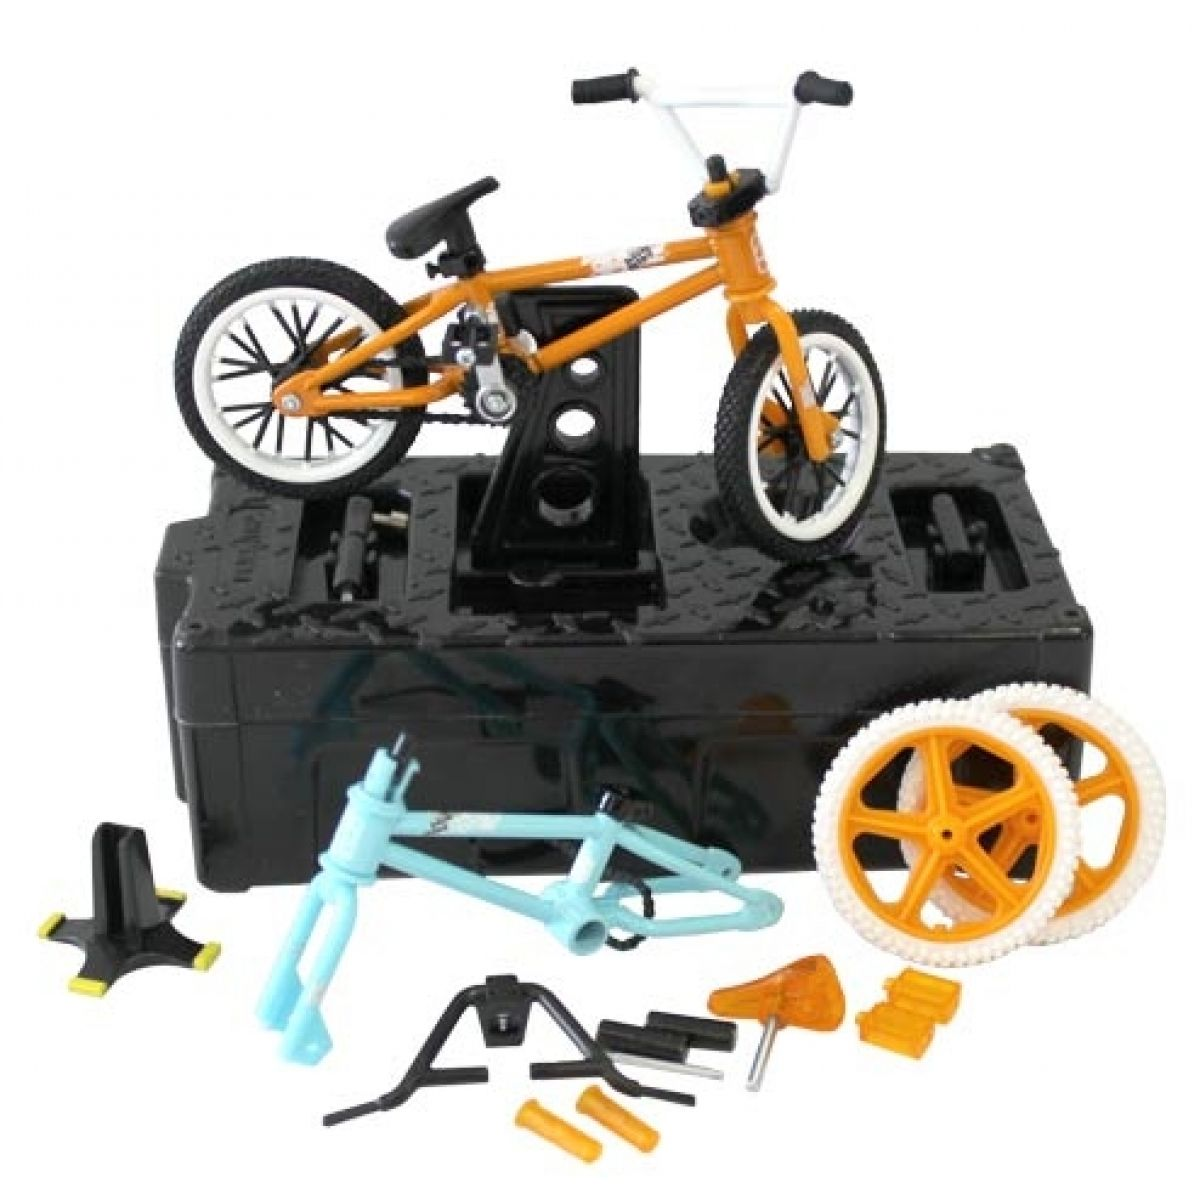 Flick Trix Fingerbikes s montážním stojanem